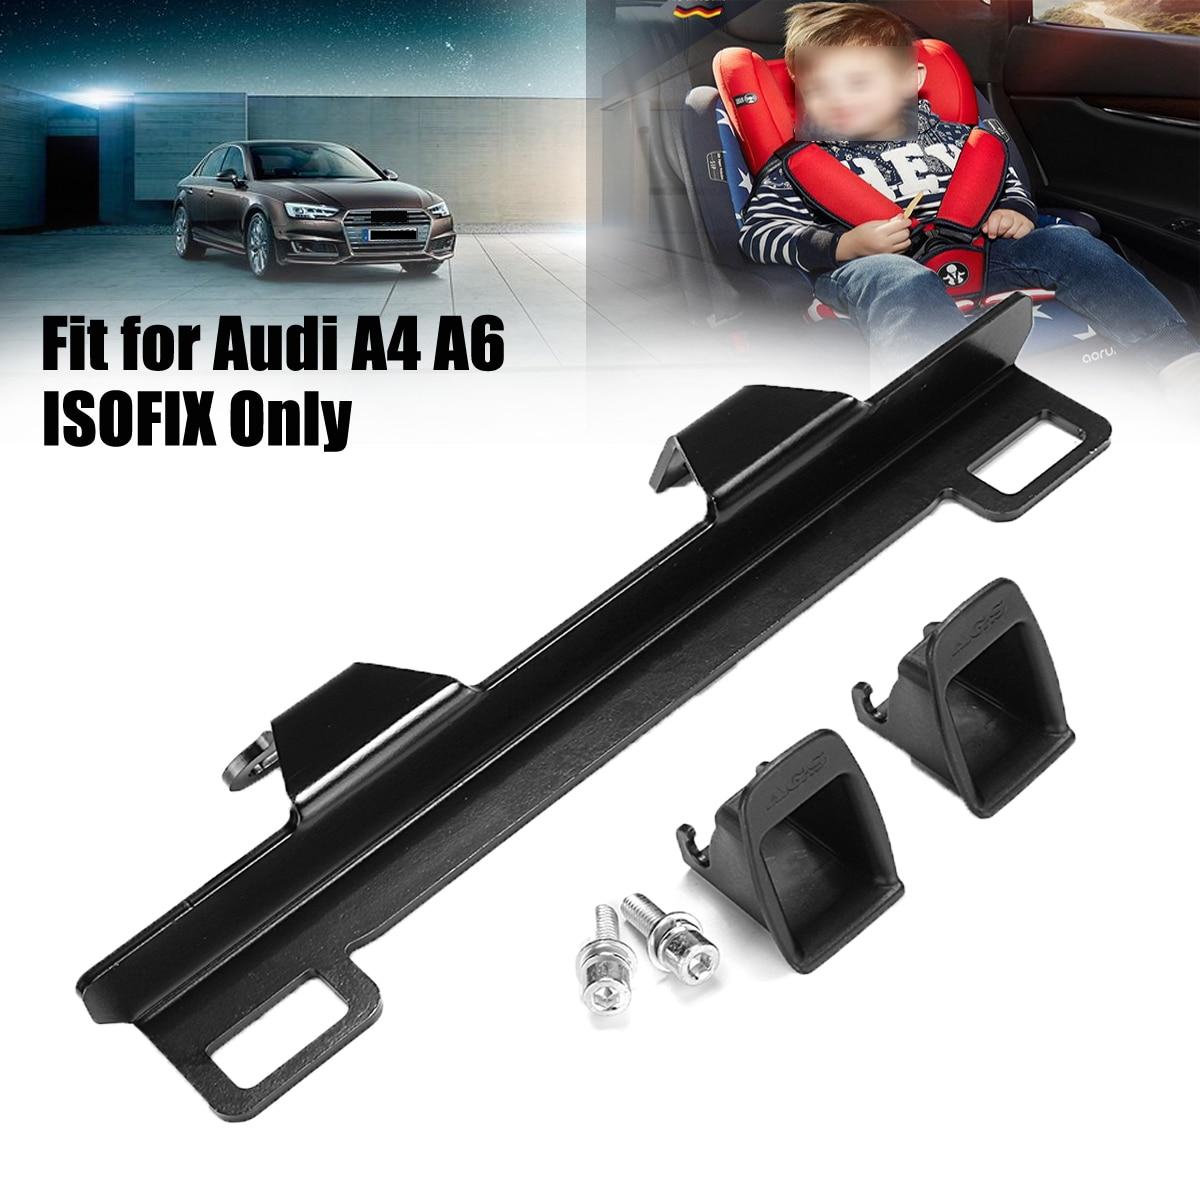 Universal Latch Isofix Belt Connector Car Seat Belt Interfaces Guide